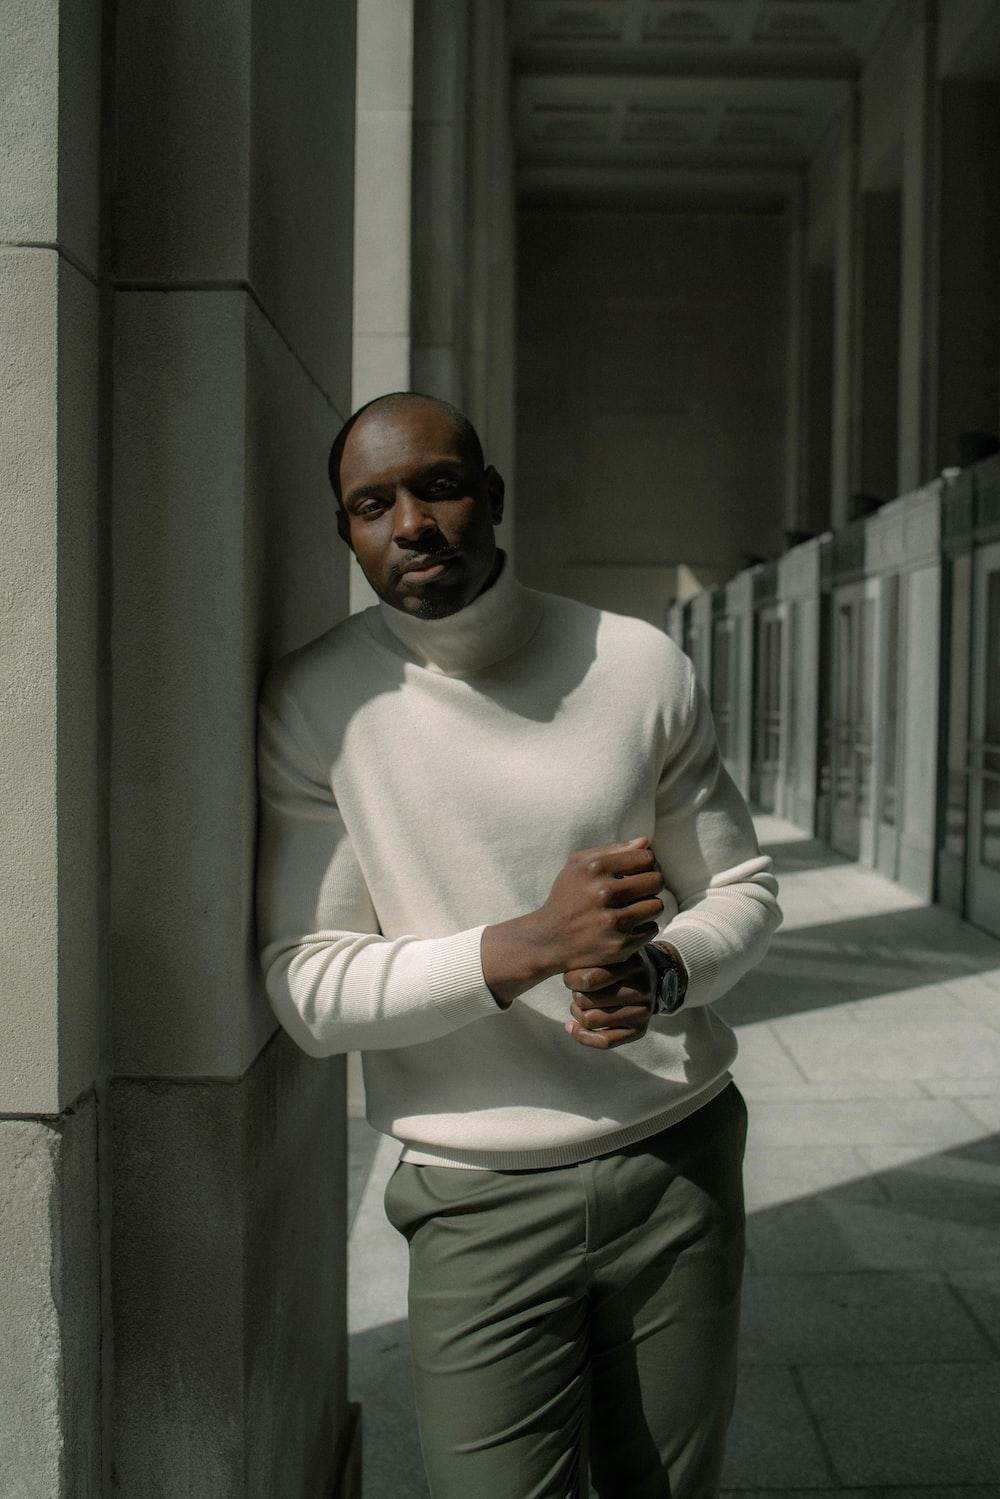 man in white turtleneck sweater holding black camera